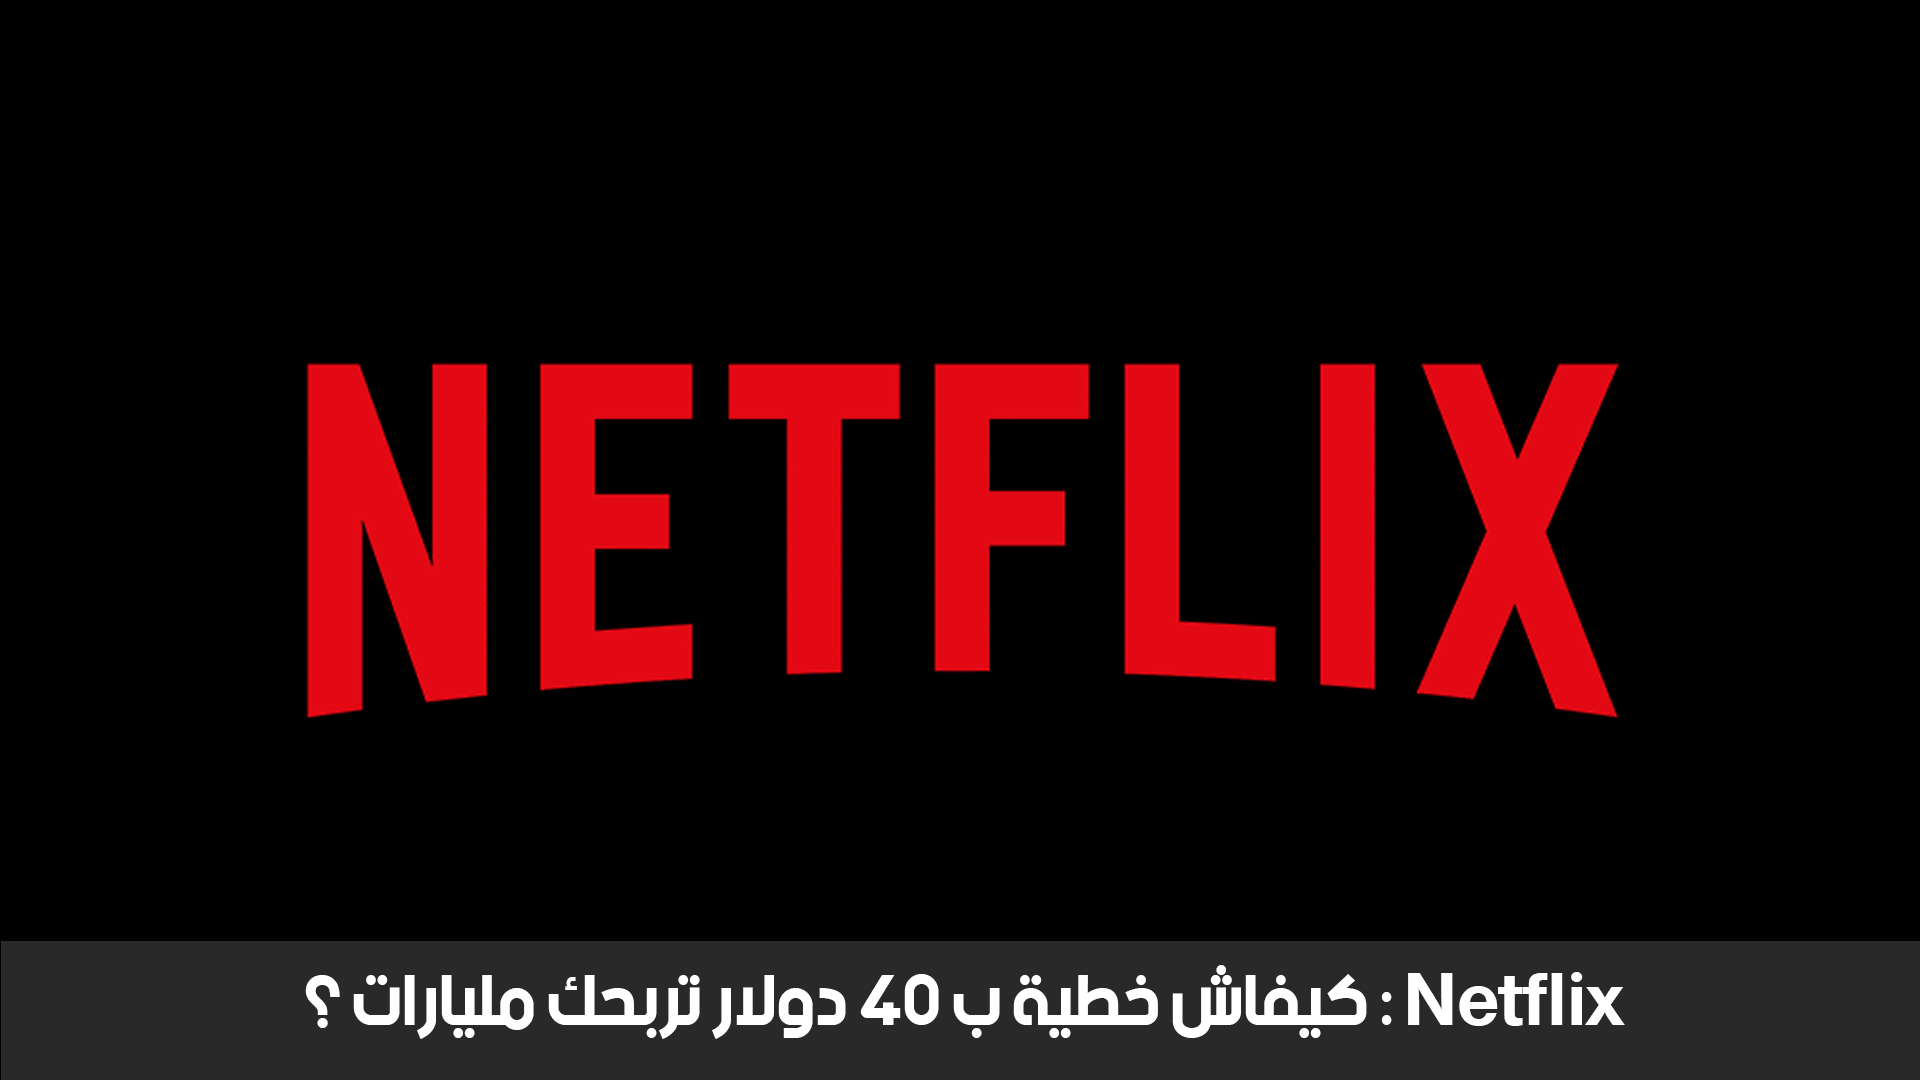 Netflix كيفاش خطية ب40 دولار تربحك مليارات